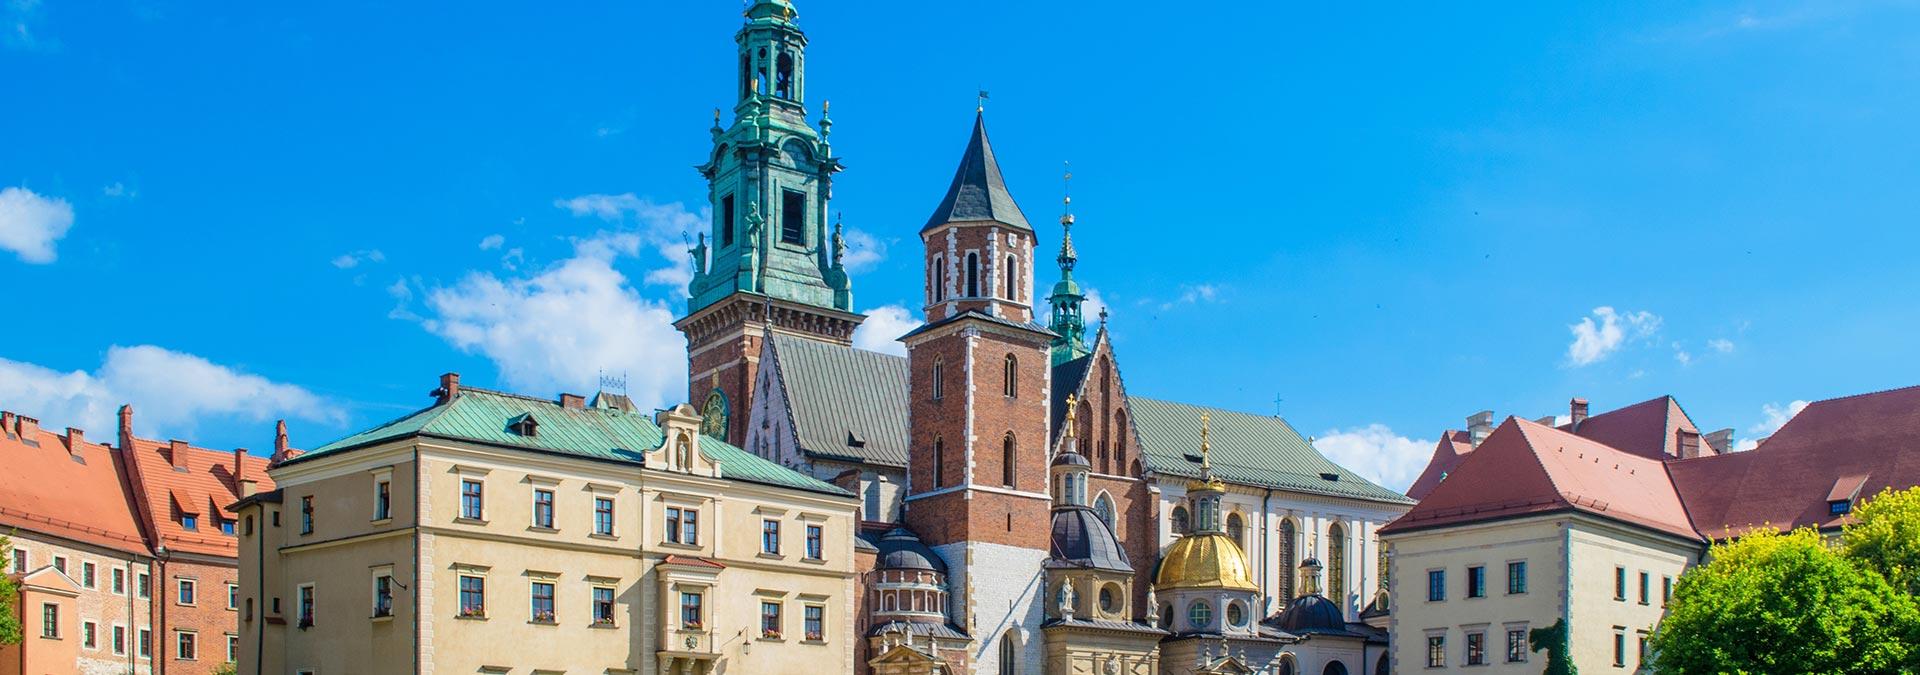 Central Europe Tour - Czech, Austria, Slovakia, Hungary, Poland - Prague, Vienna, Budapest, Krakow, Bratislava, Slovakia Travel, Location